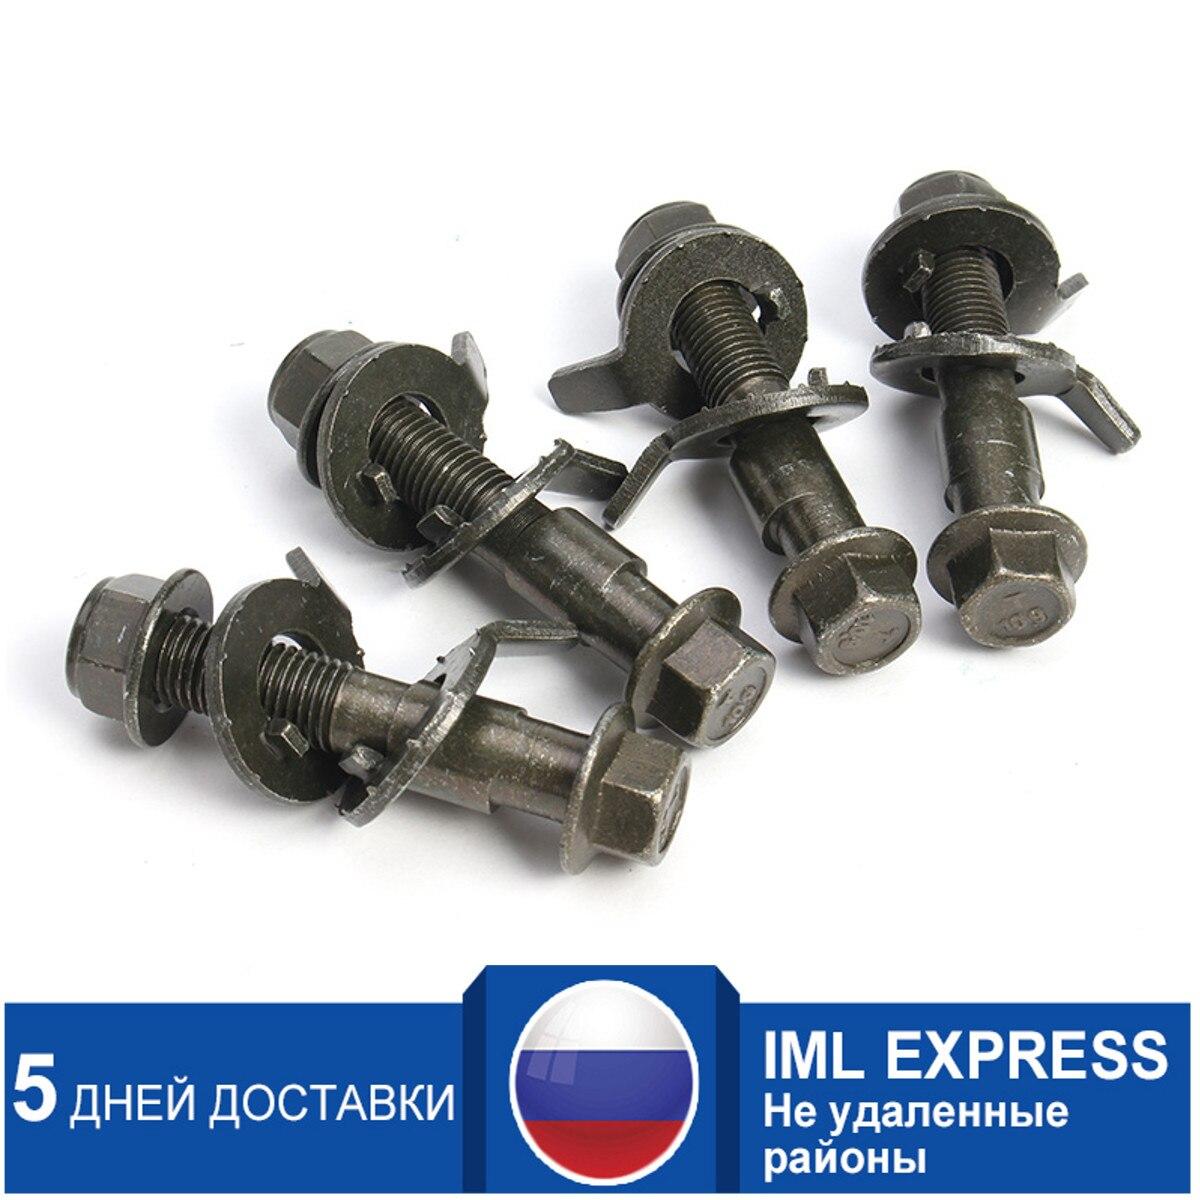 4pcs/lot 14mm 12mm Wheel Alignment Camber Adjustment Screw Bolt Kit Cam Bolt Fits 14mm 12mm Wheel Alignment